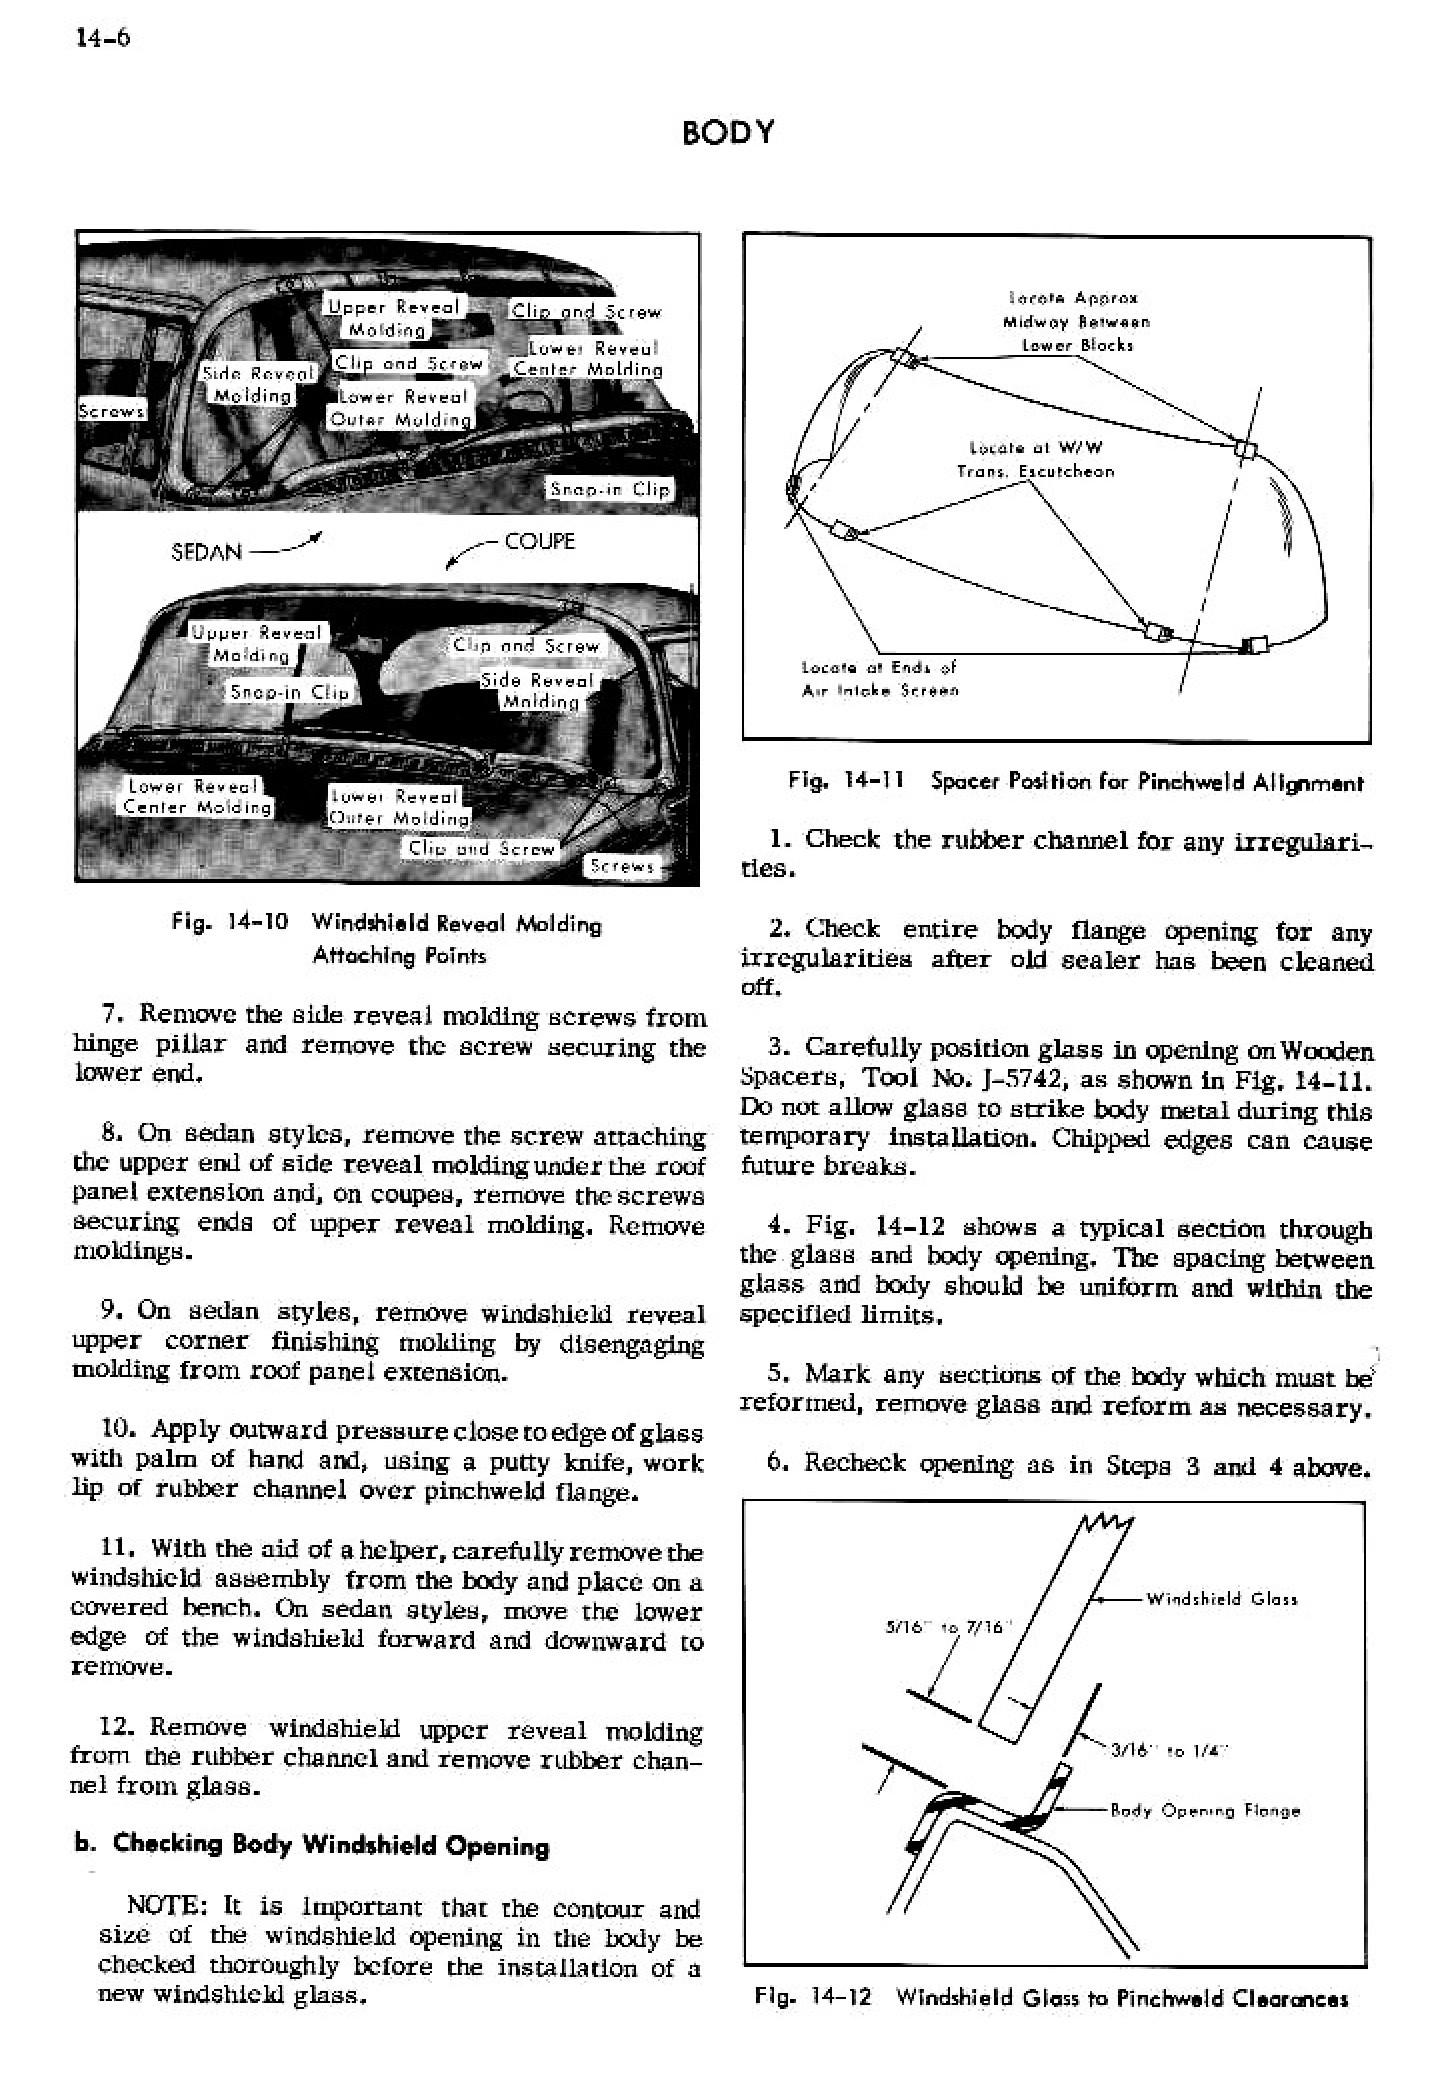 1956 Cadillac Shop Manual- Body Page 6 of 87